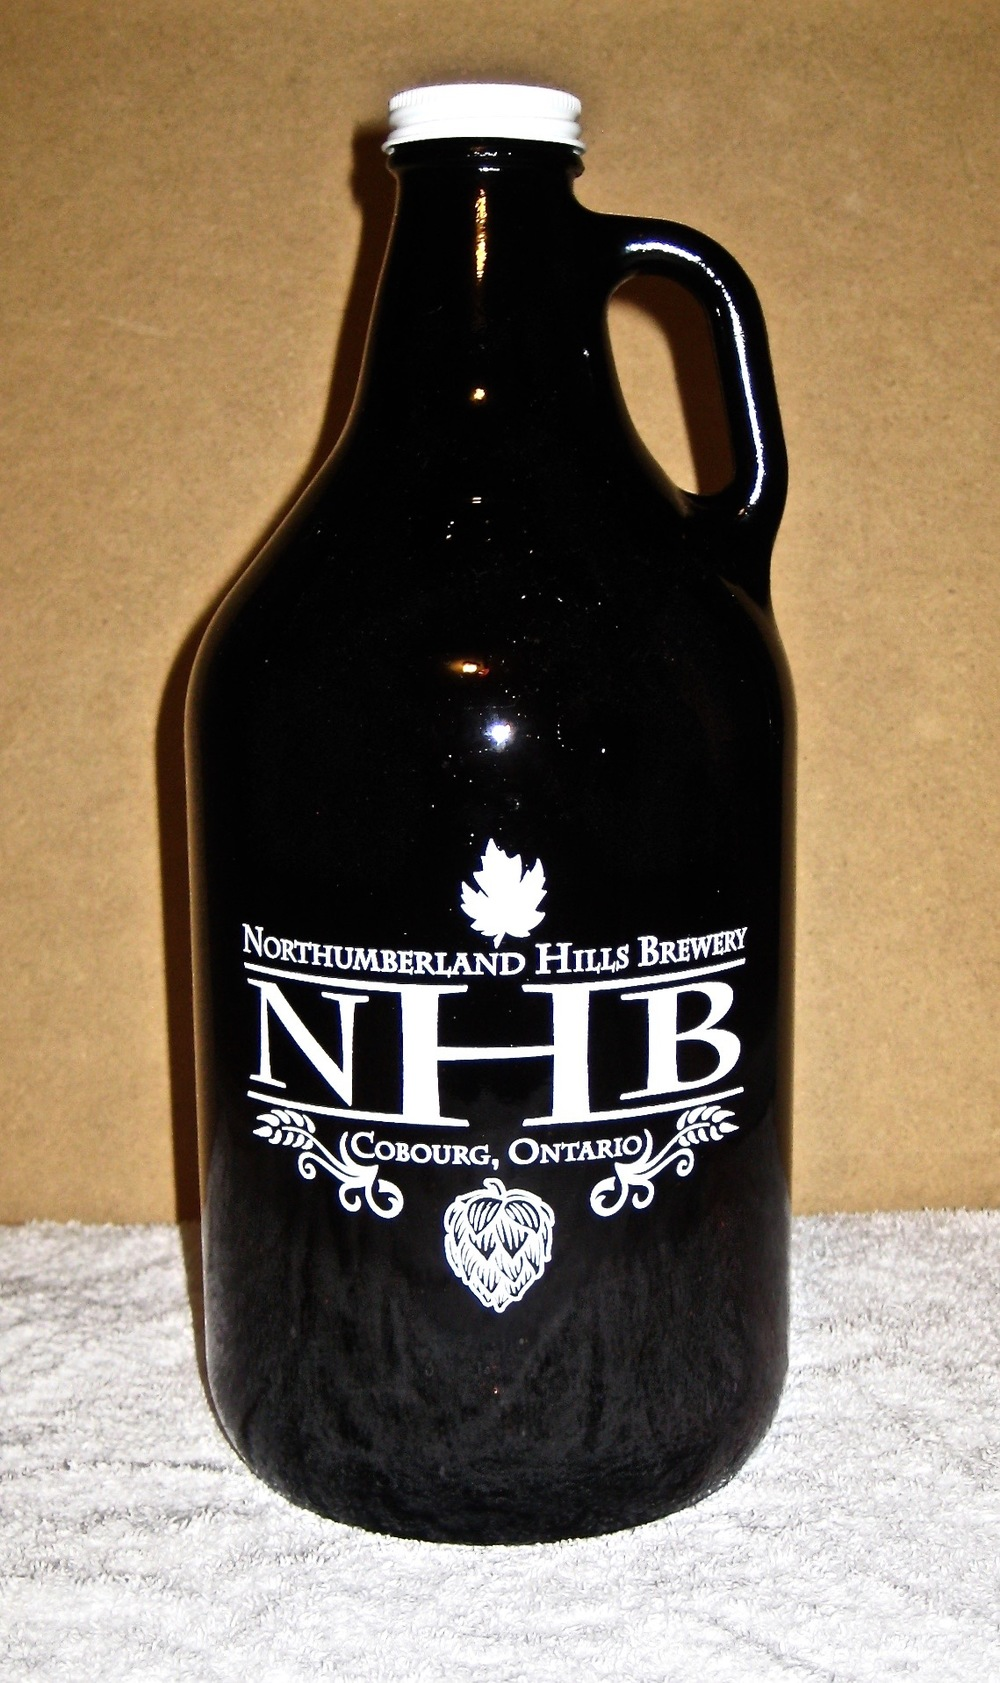 GR - Northumberland Hill Brewery (ON).jpg